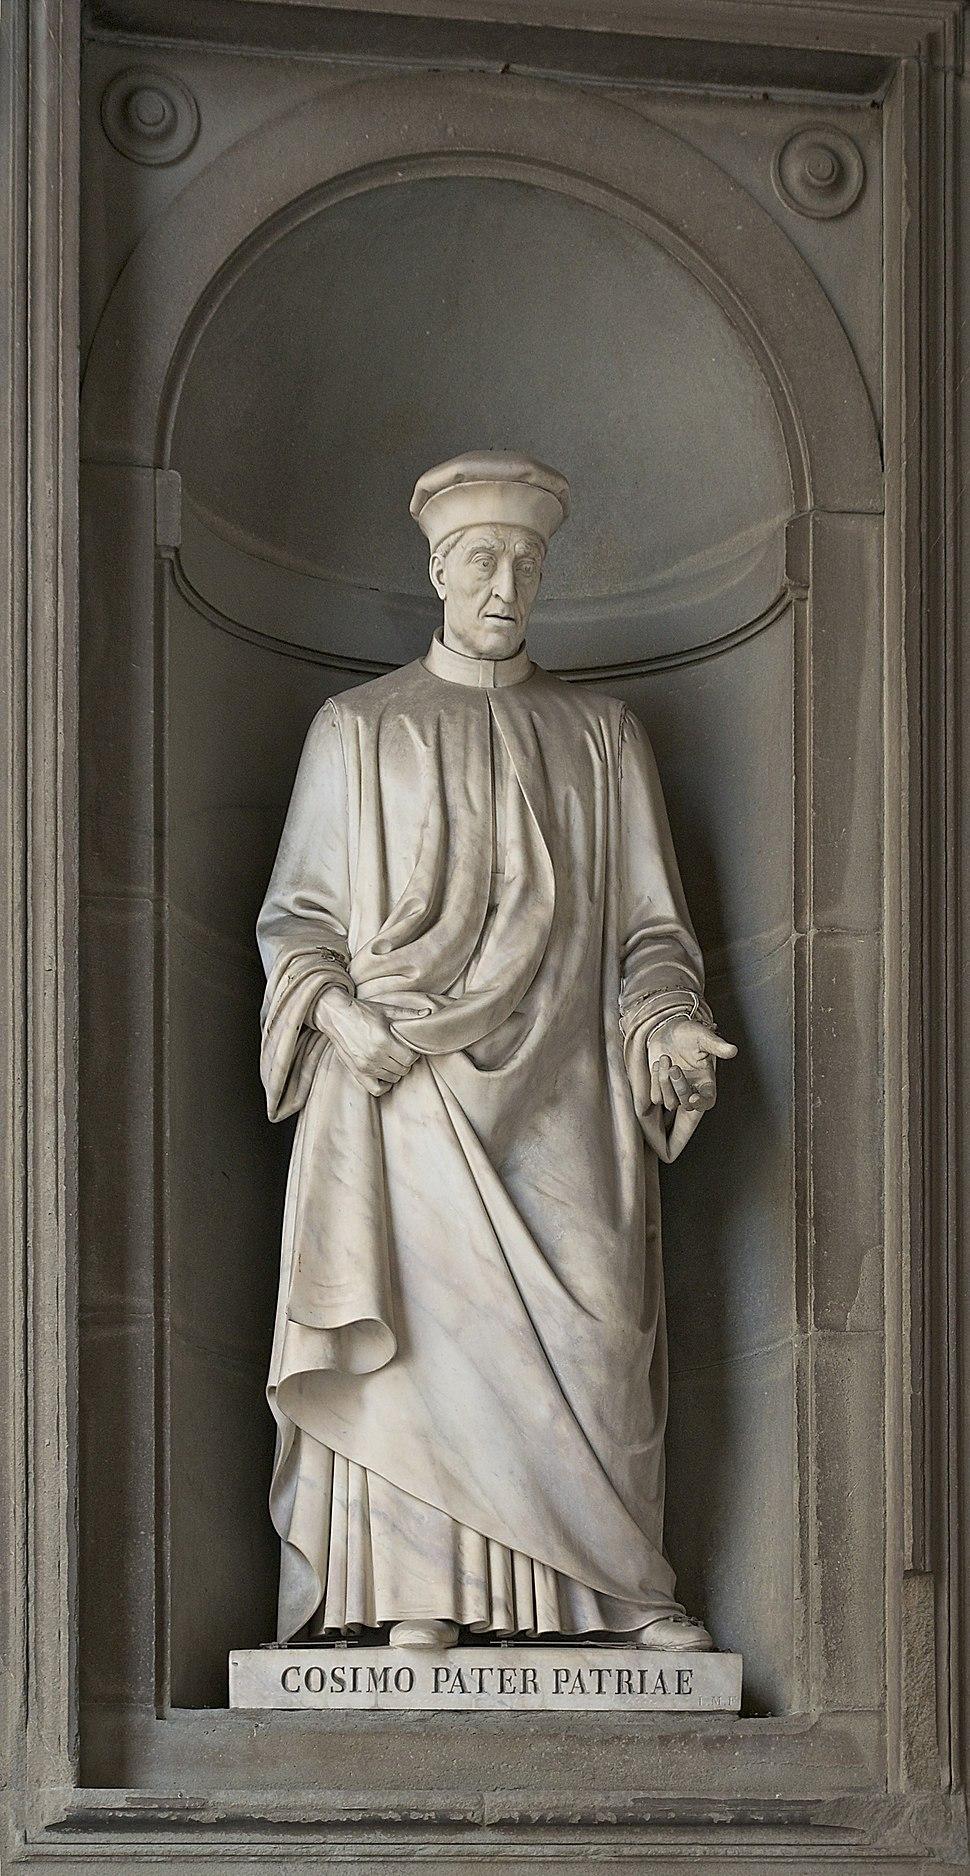 Cosimo Pater Patriae